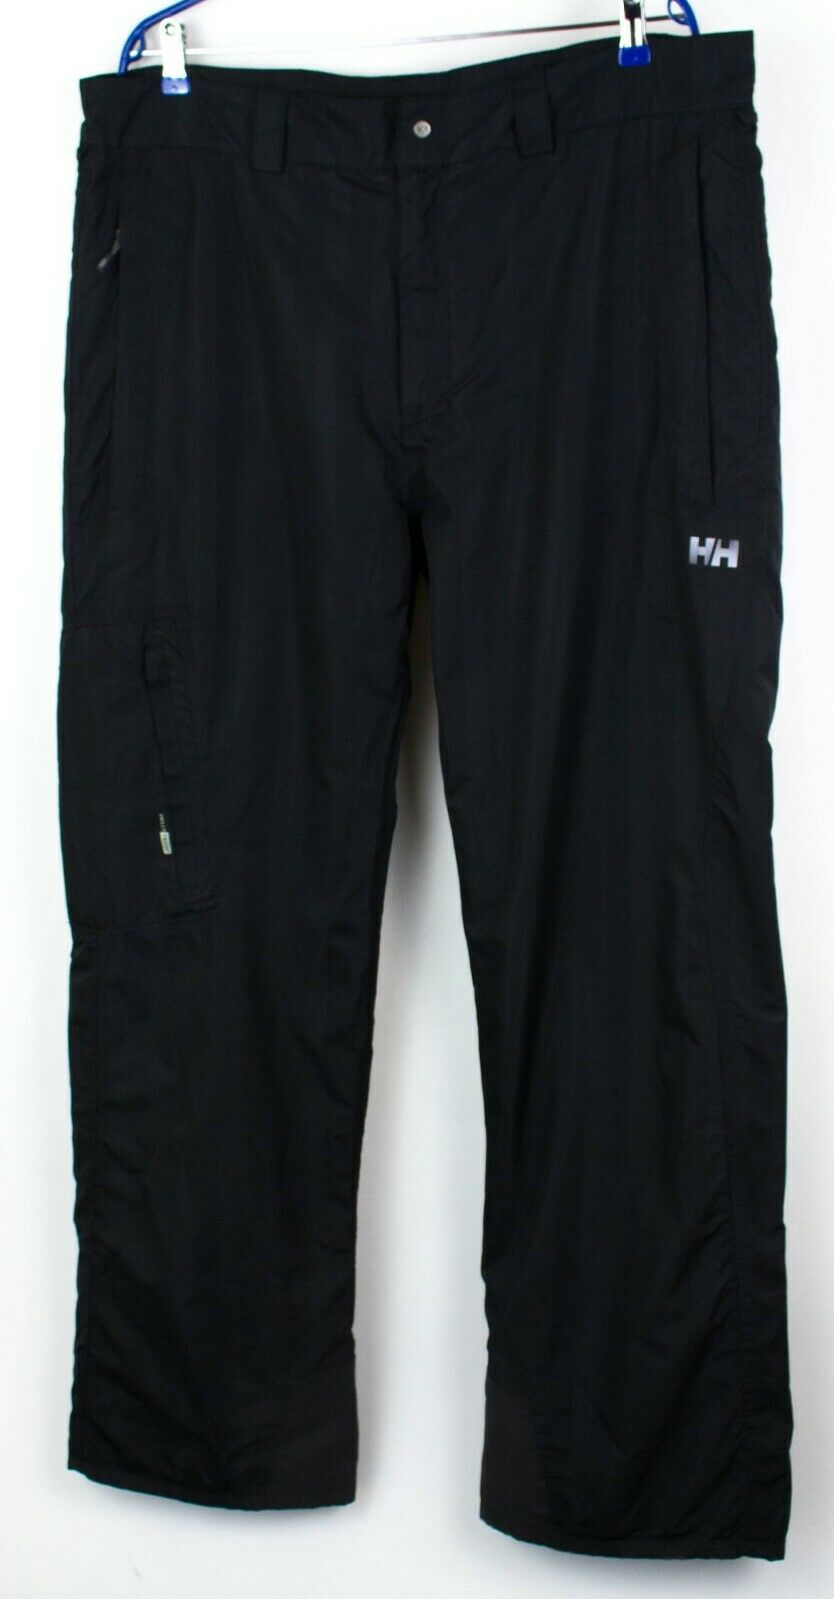 Helly hansen mens tech waterproof ski pants straight size xxl  mz283  lowest prices